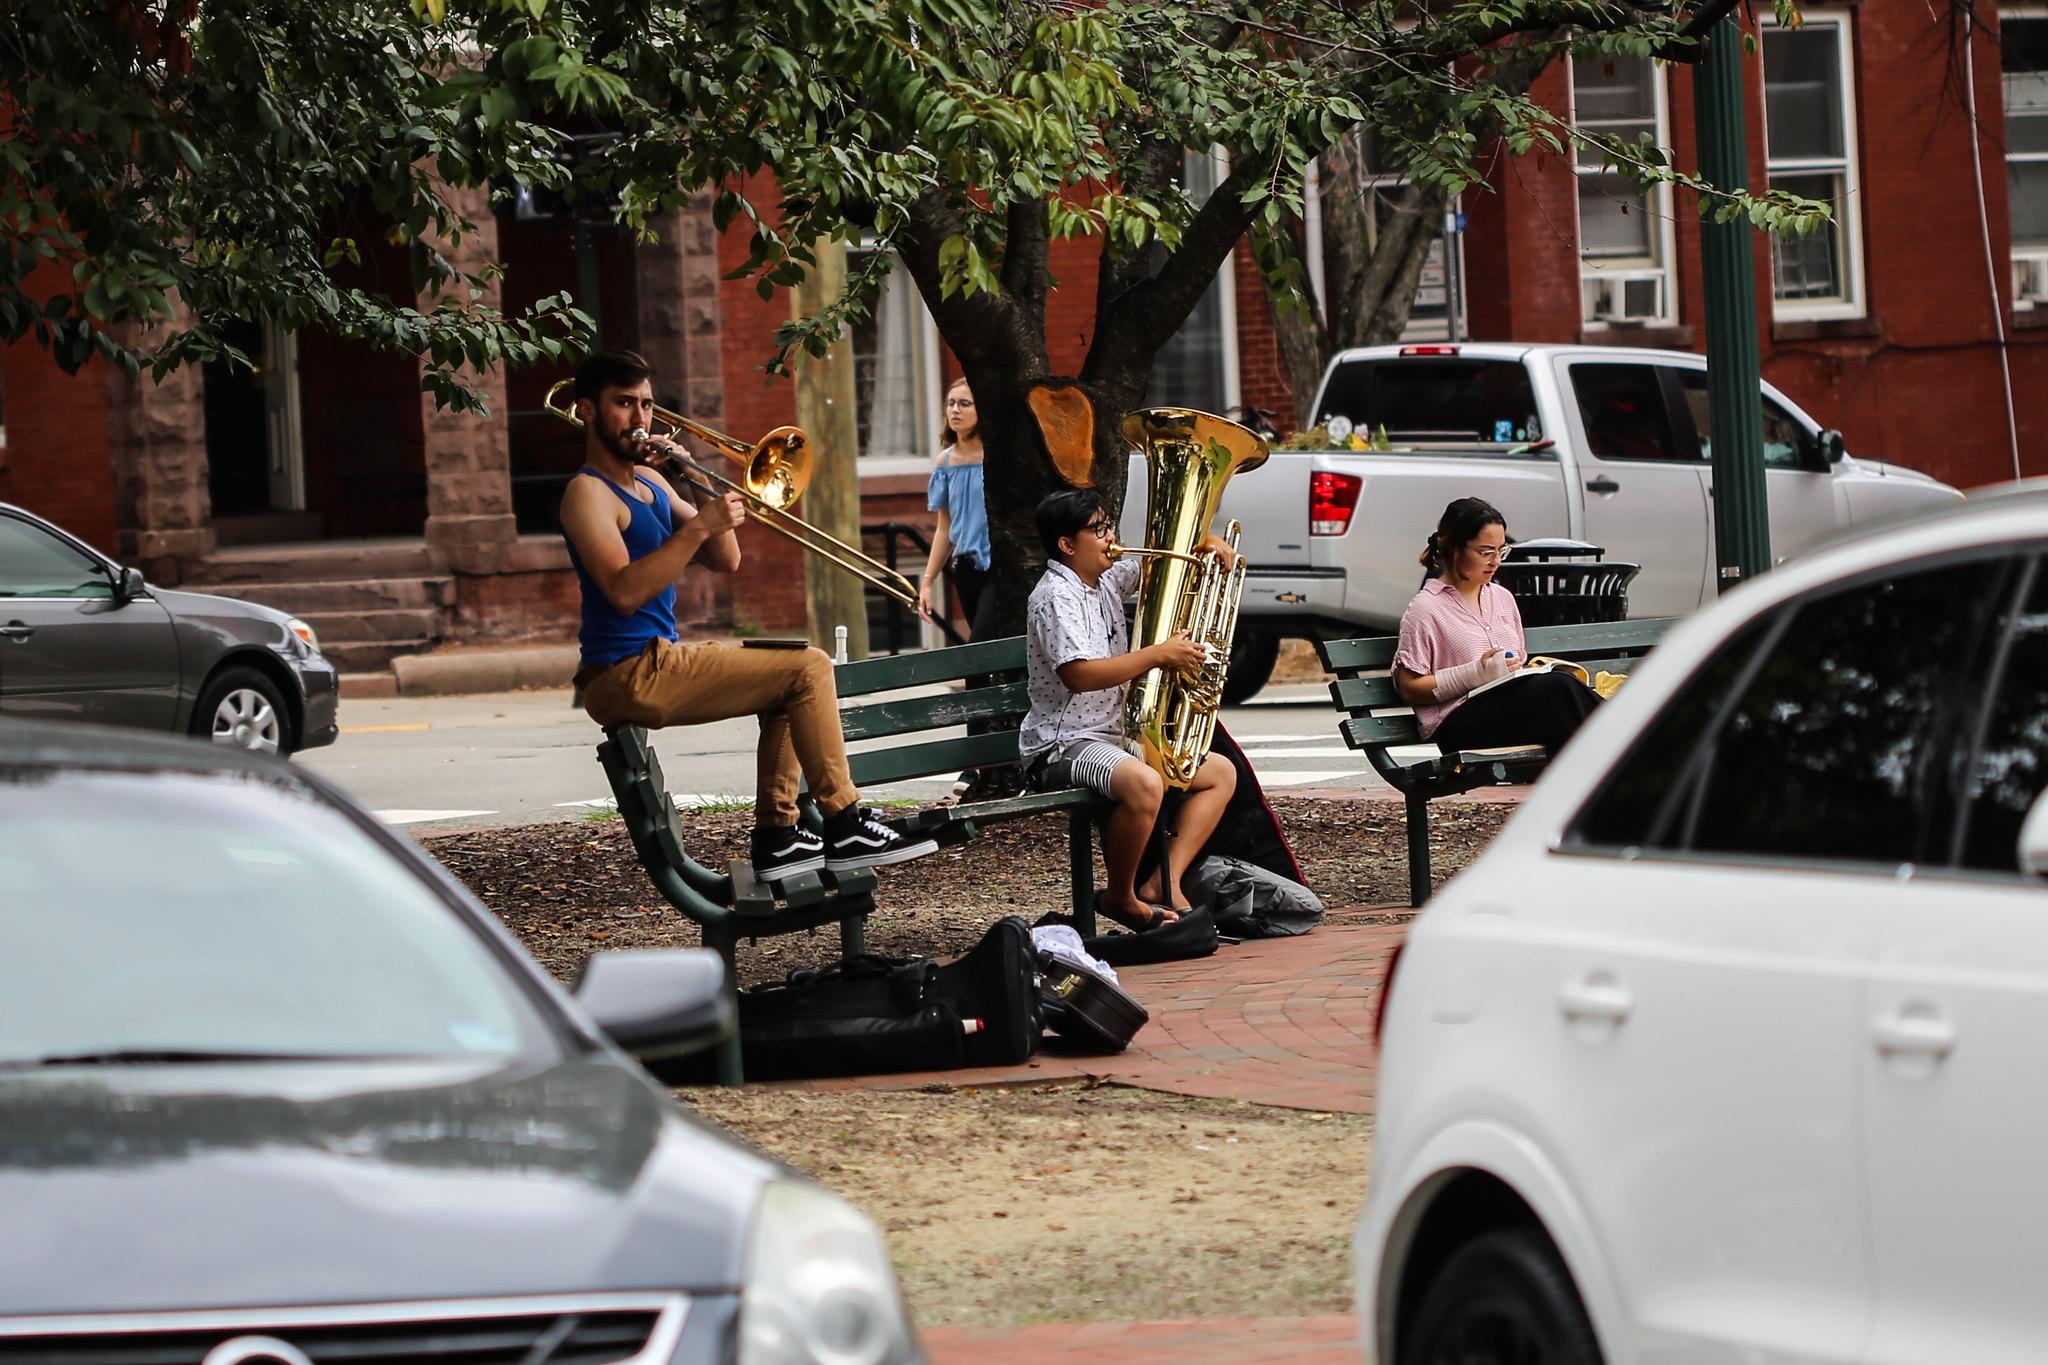 VCU brass practice in the park